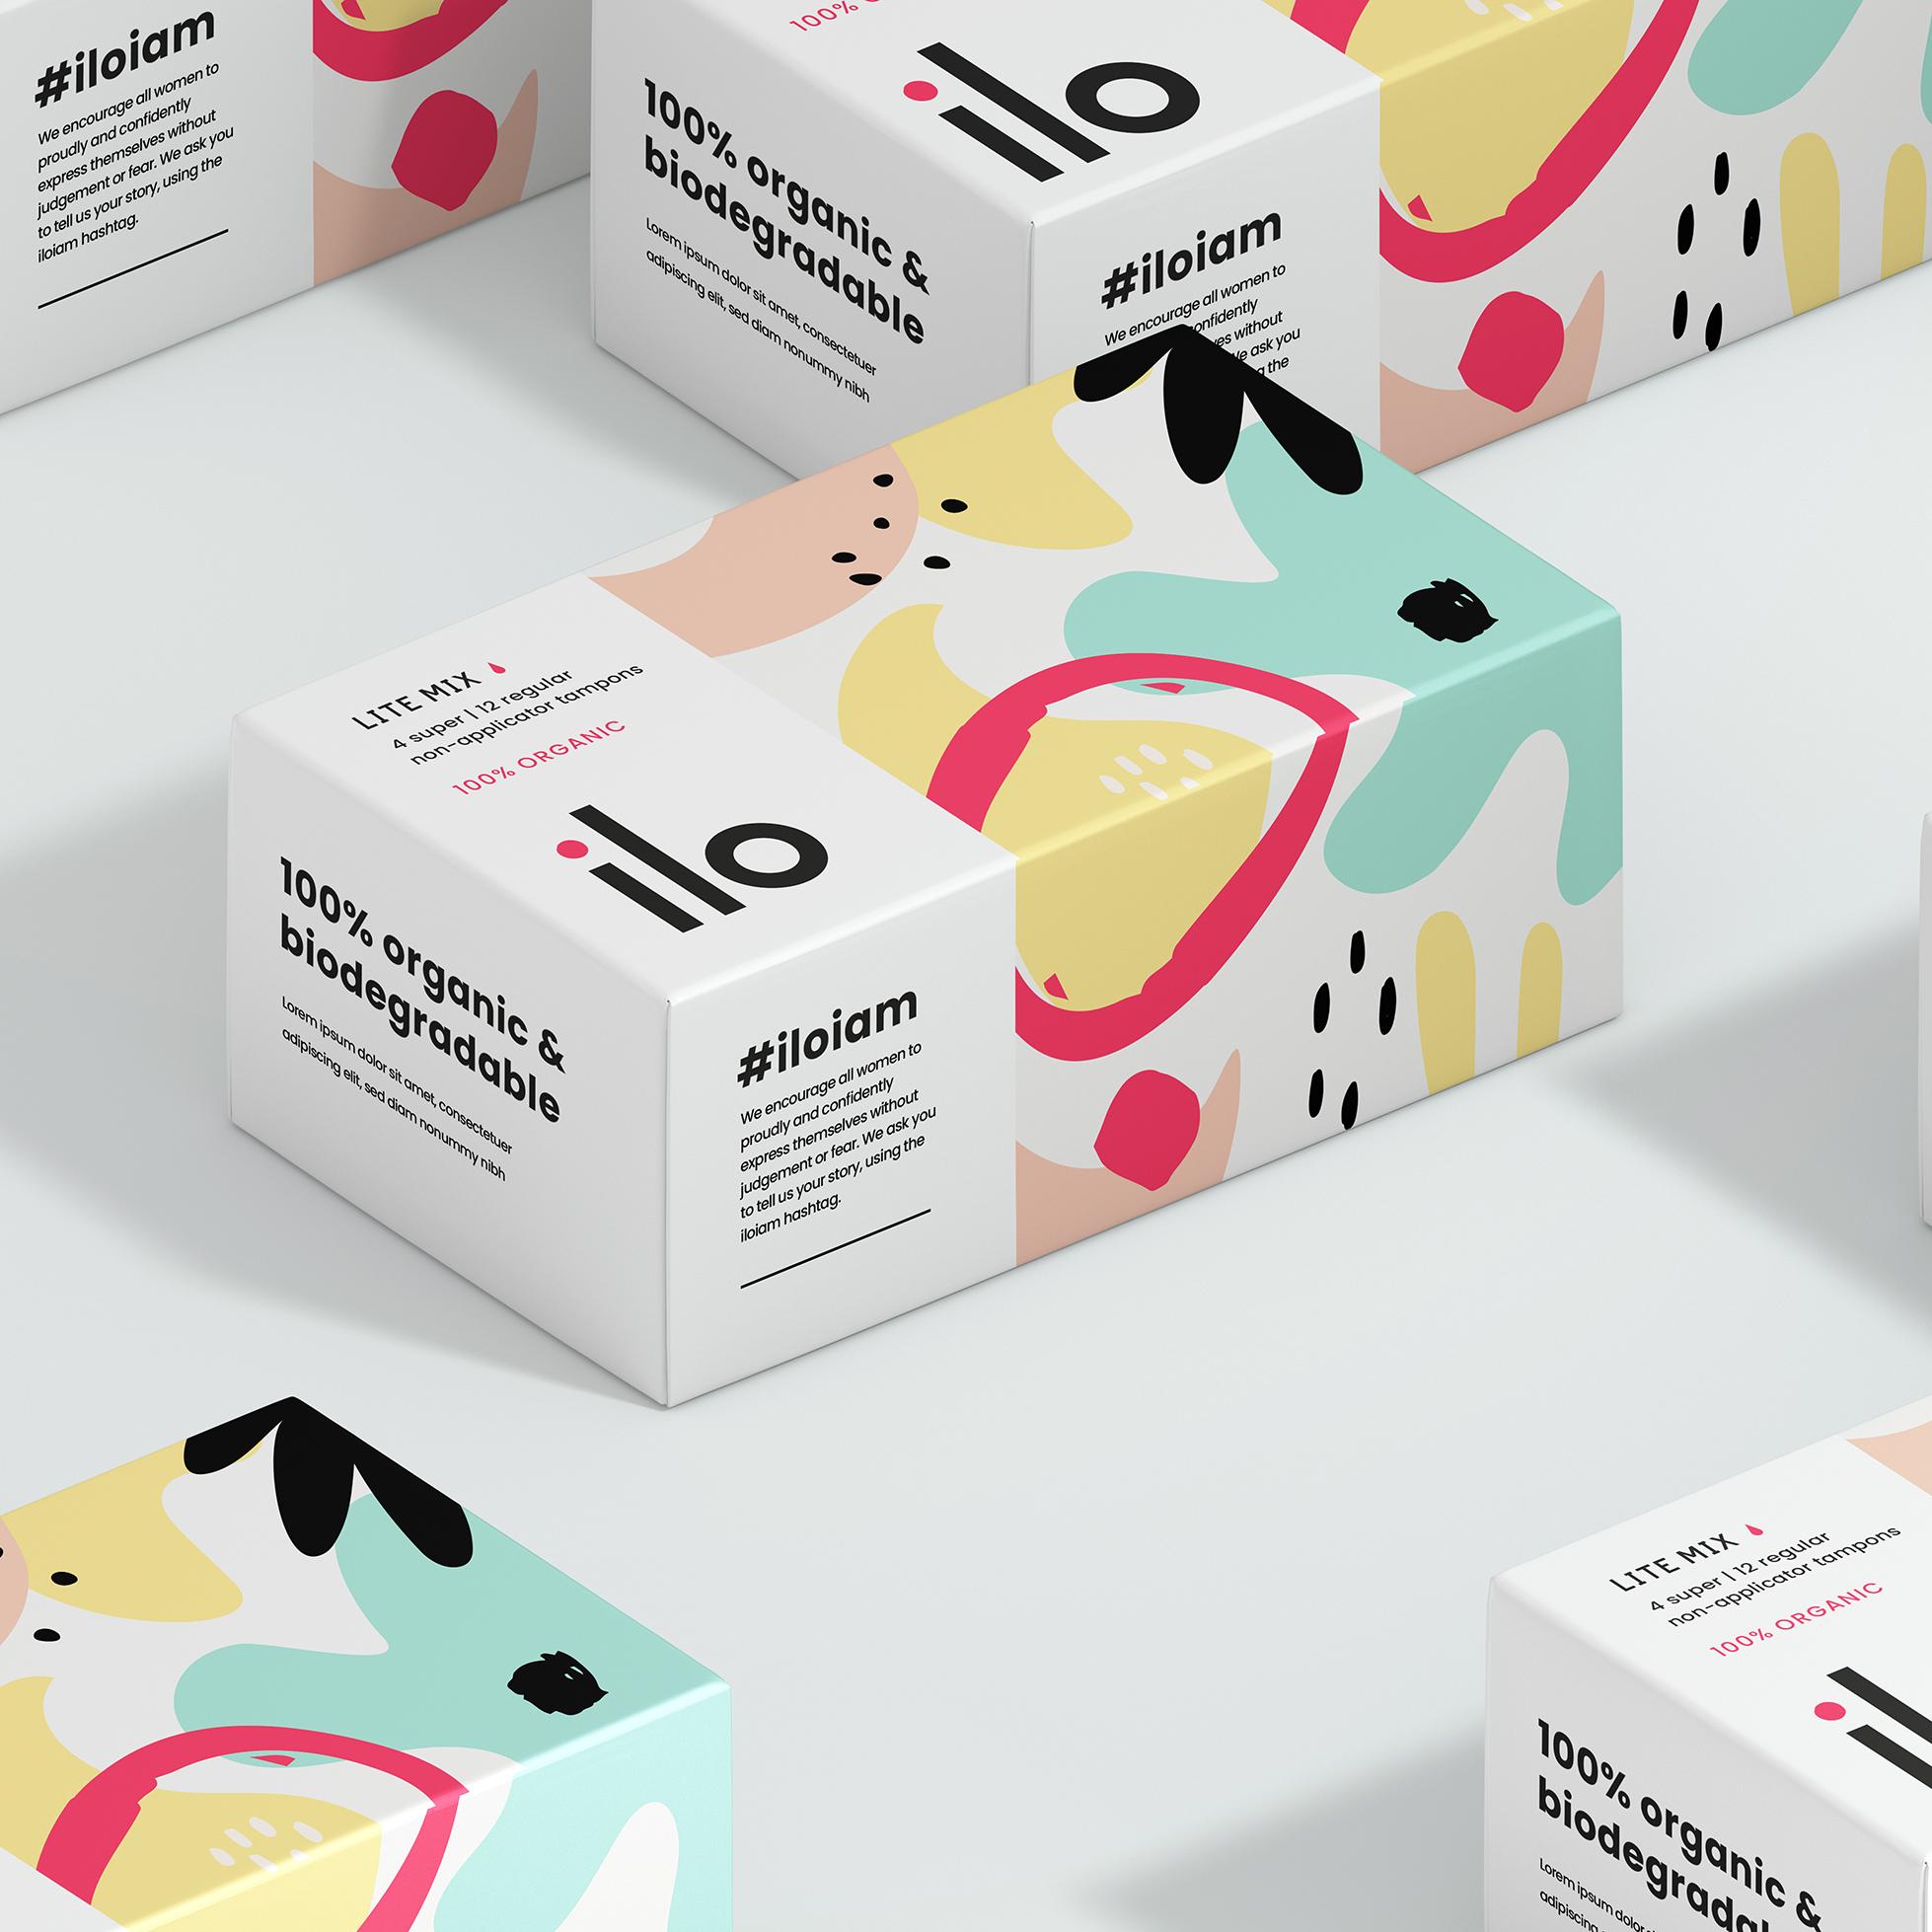 lite tampon box mock up.jpg